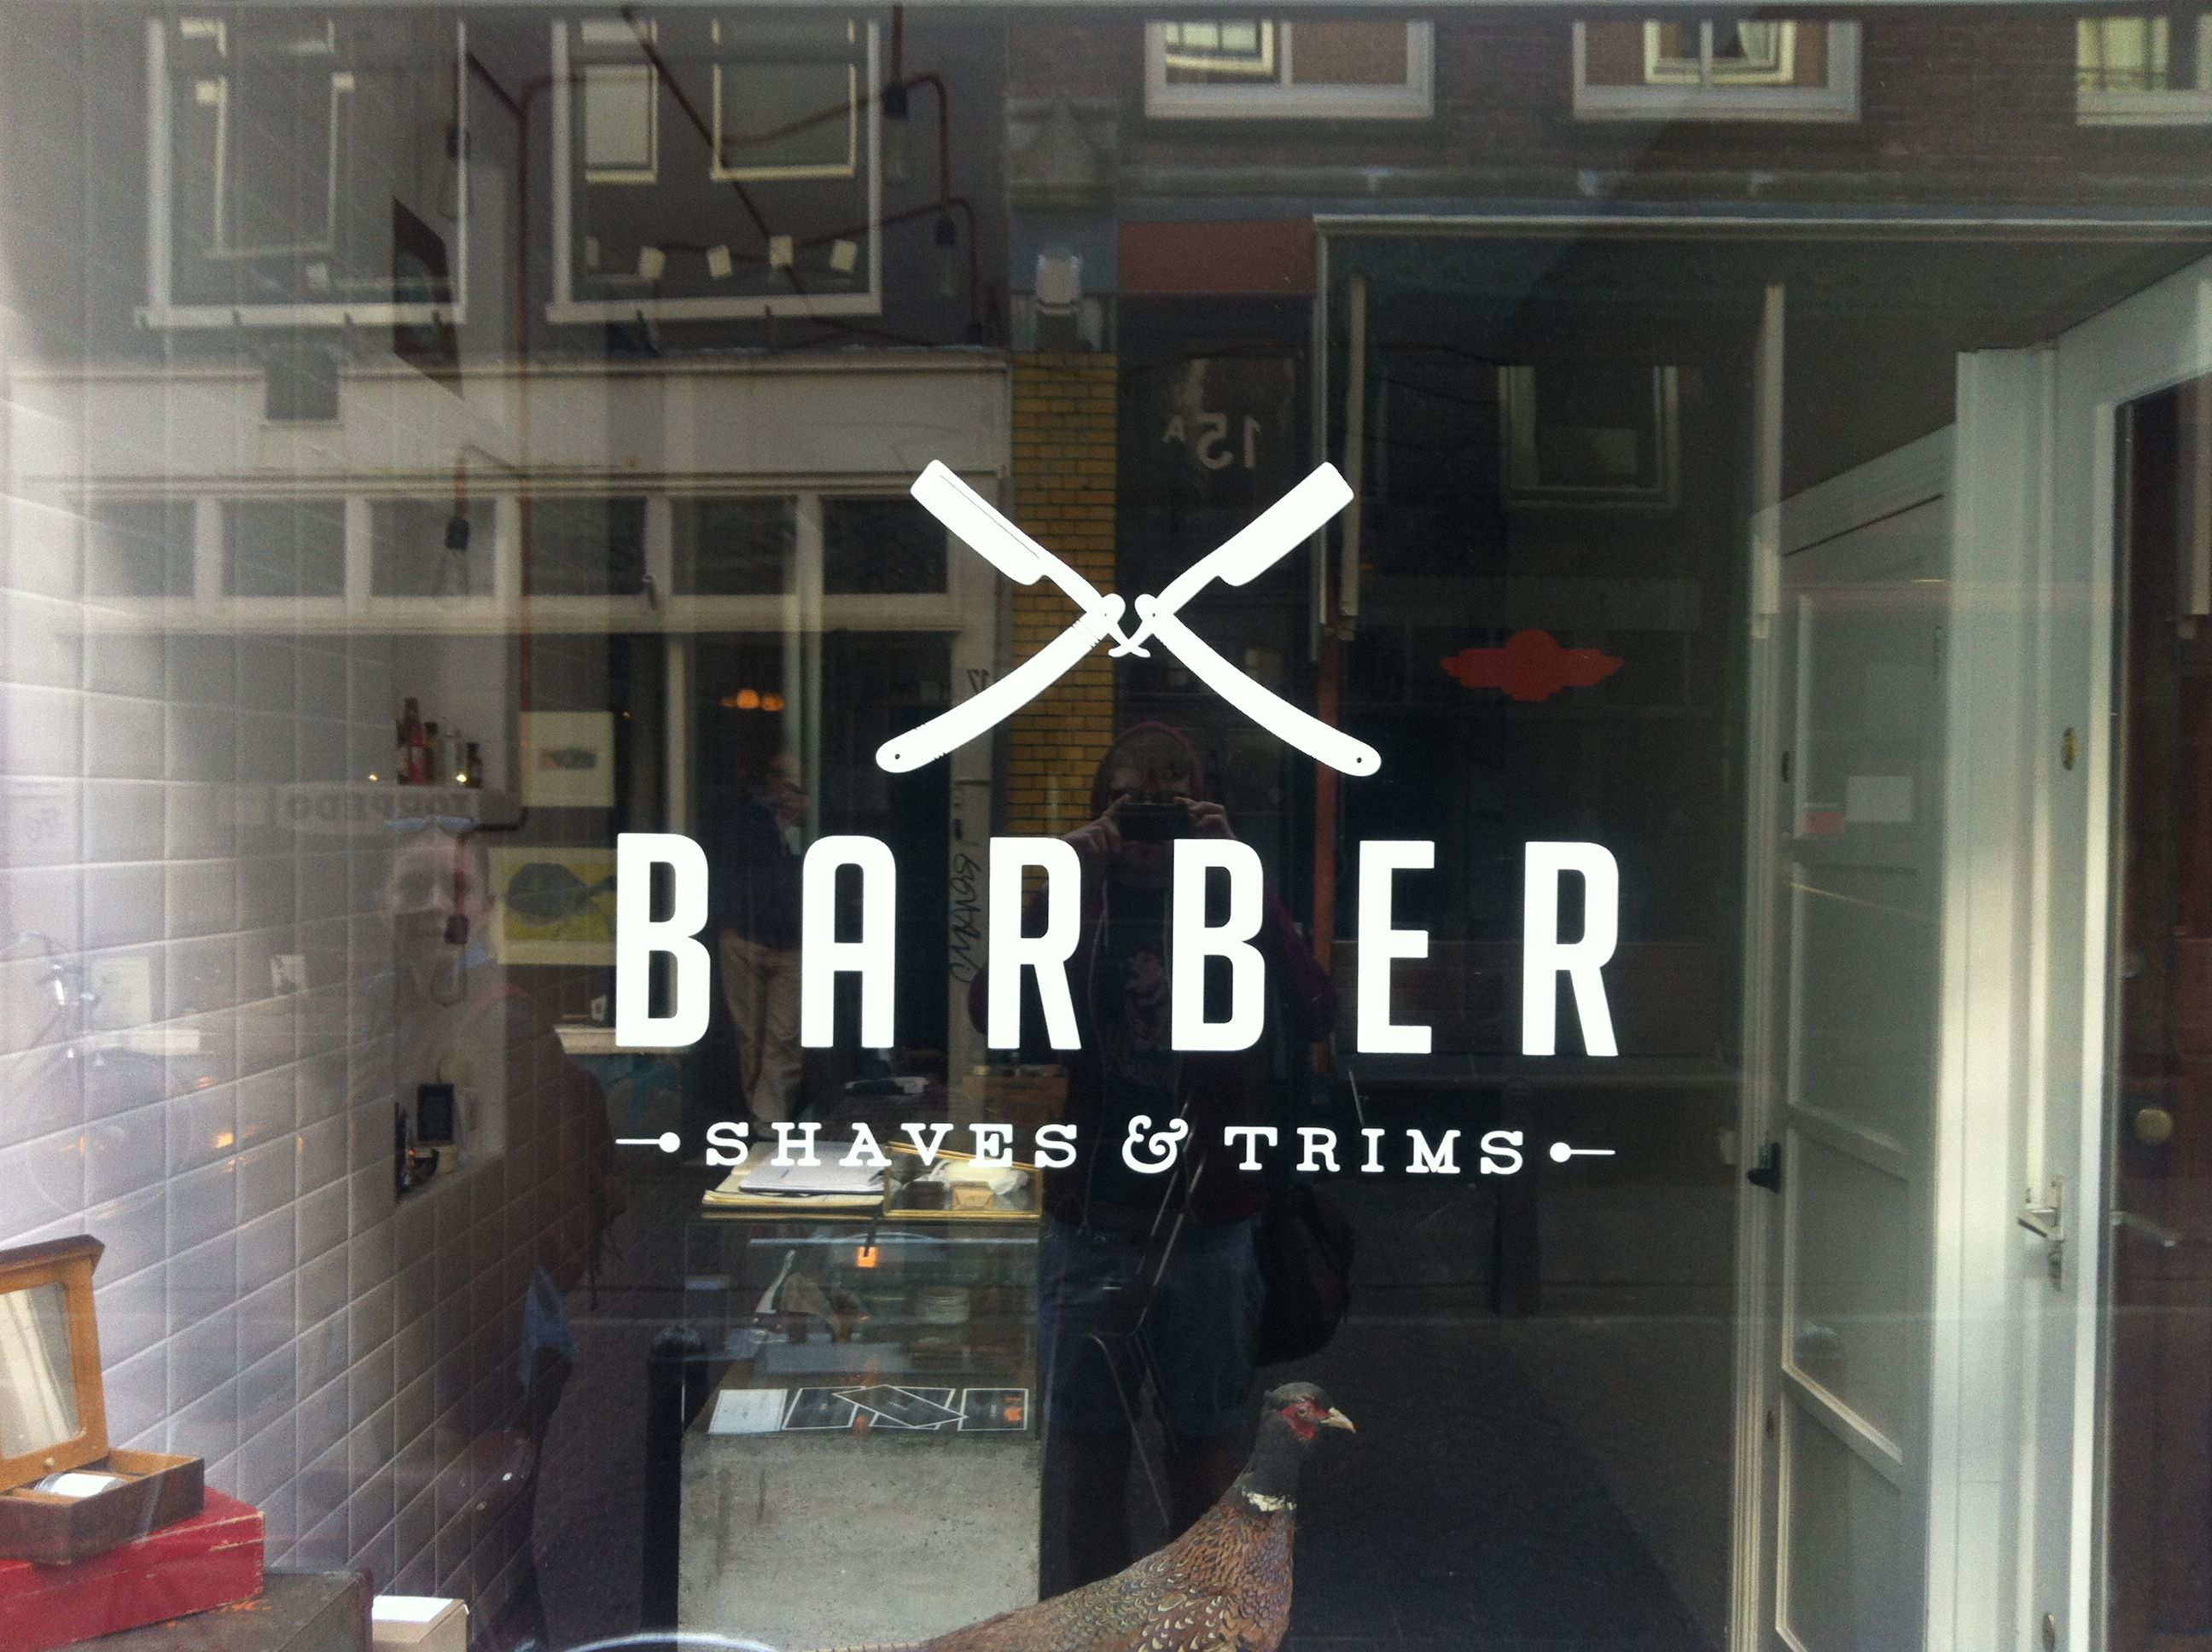 Old barber shop window - Old Barber Shop Window